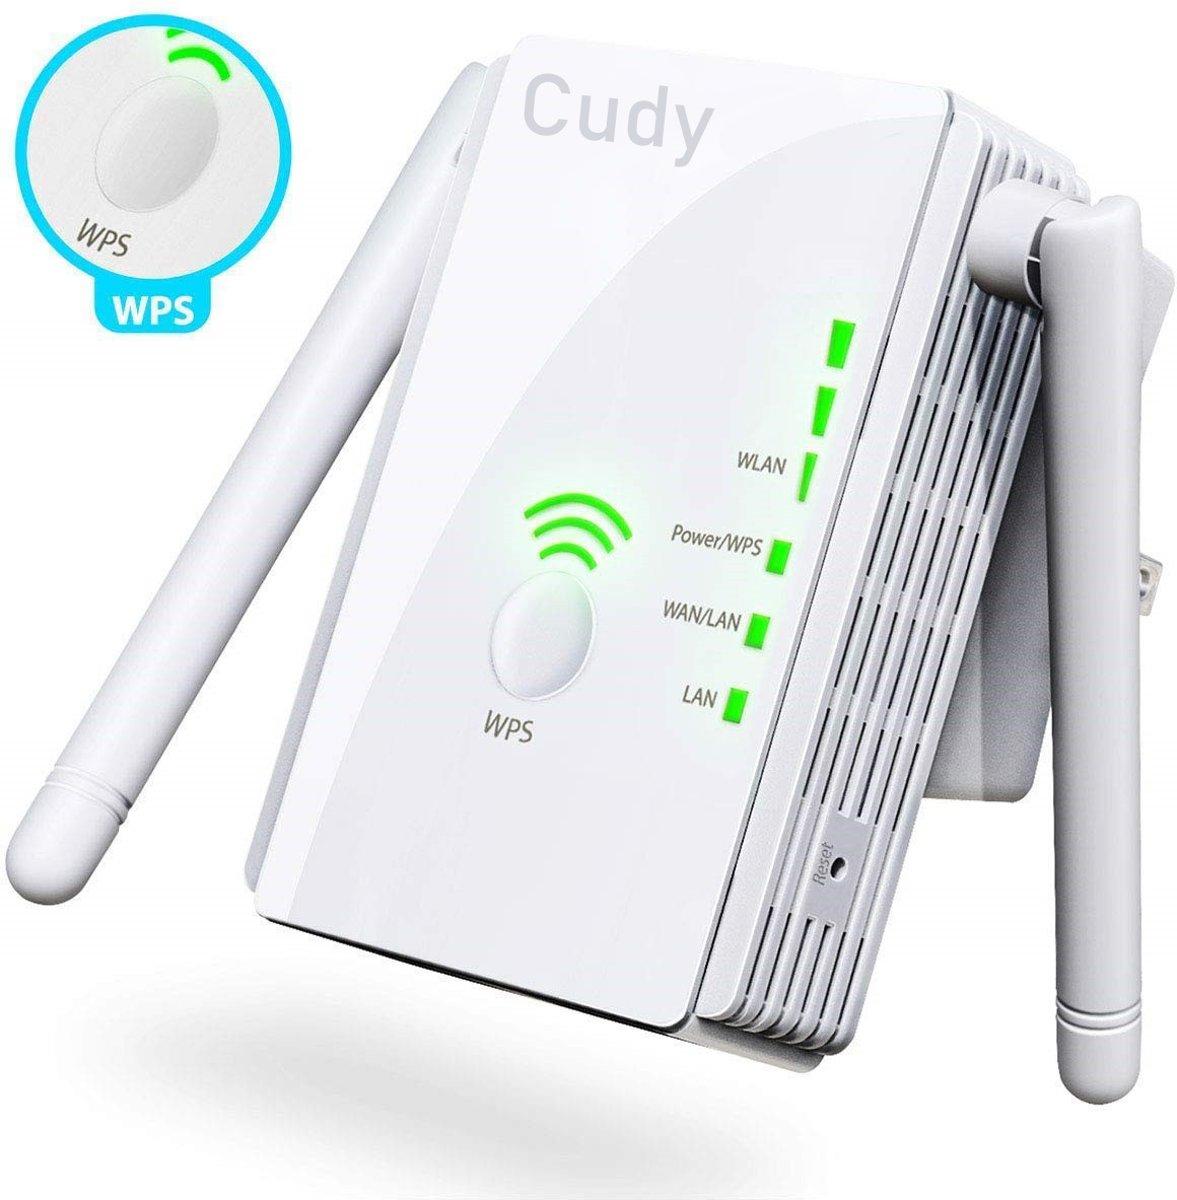 Cudy - Wifi Signaalversterker - Stopcontact - Ethernet - Wireless Range Extender- 300 mbps - 2.4 Ghz - Wit kopen